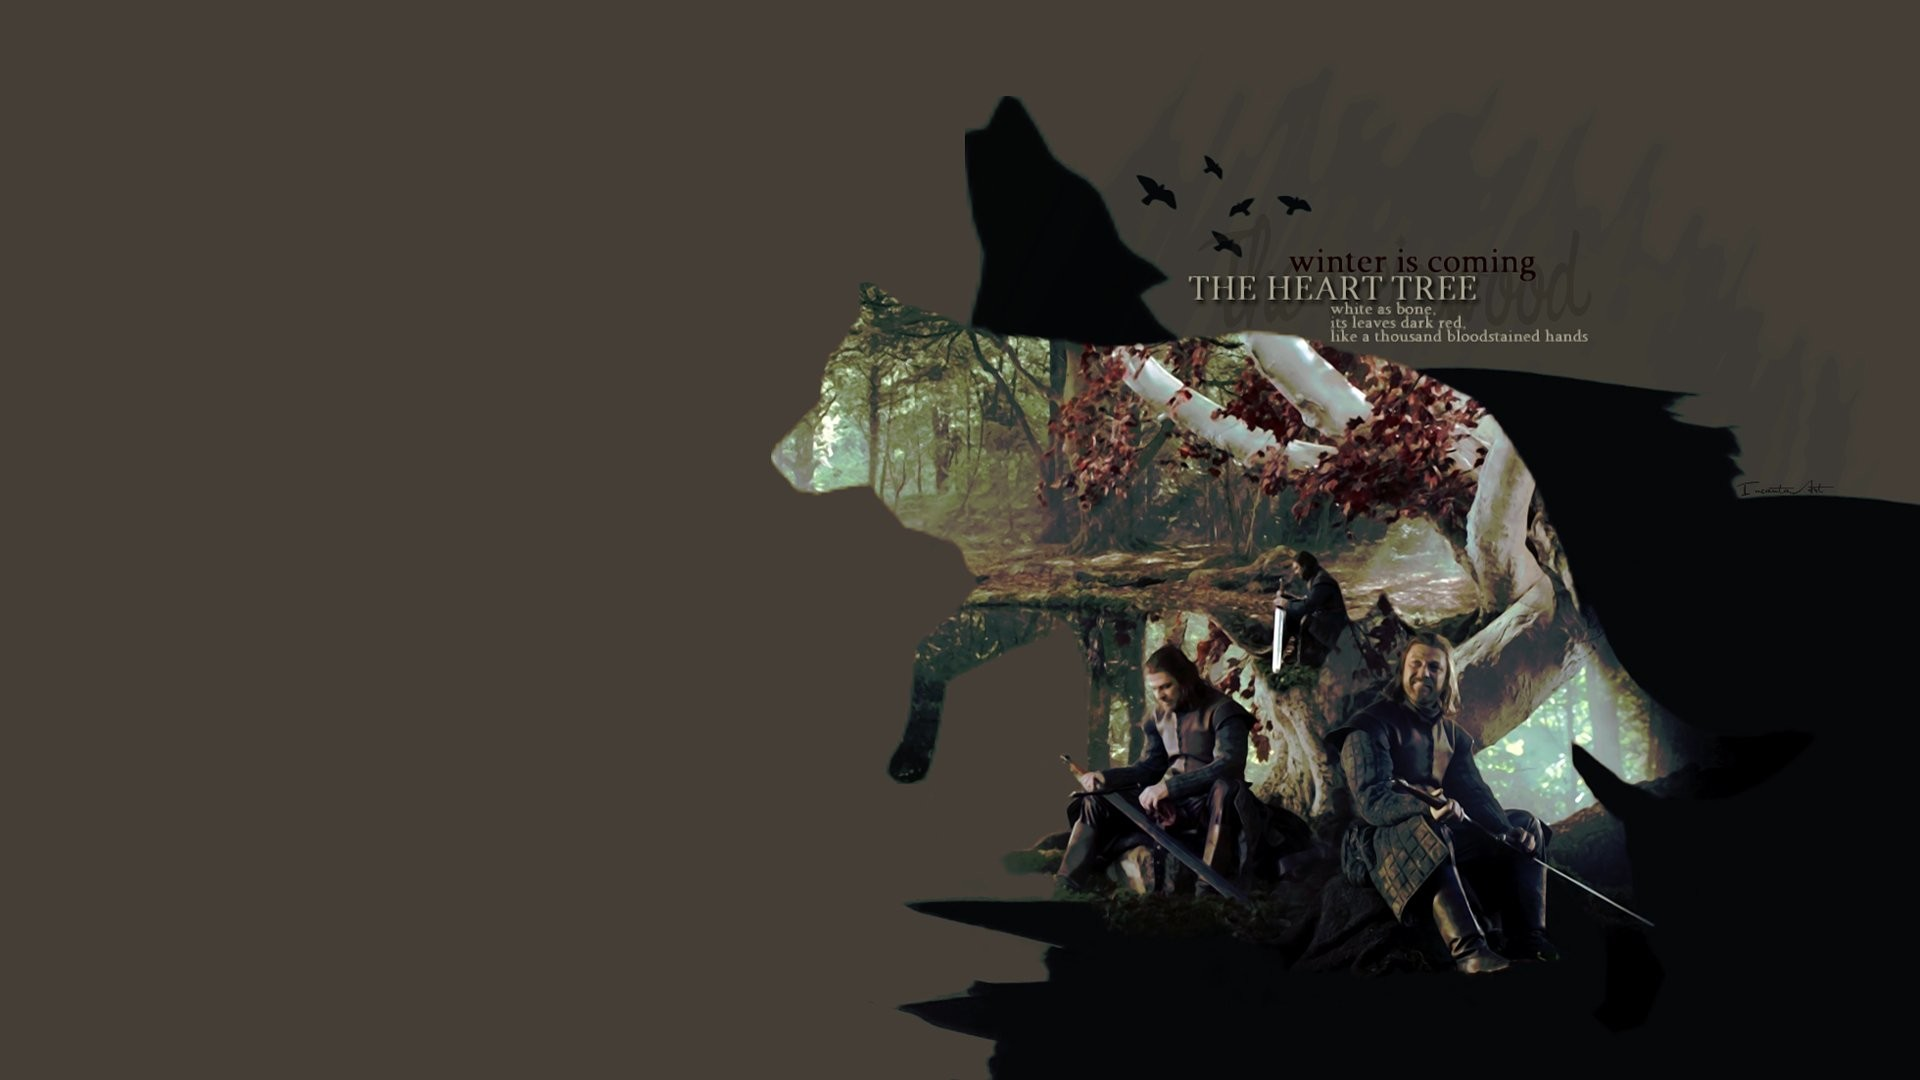 Game Of Thrones Wallpaper Wallpaper